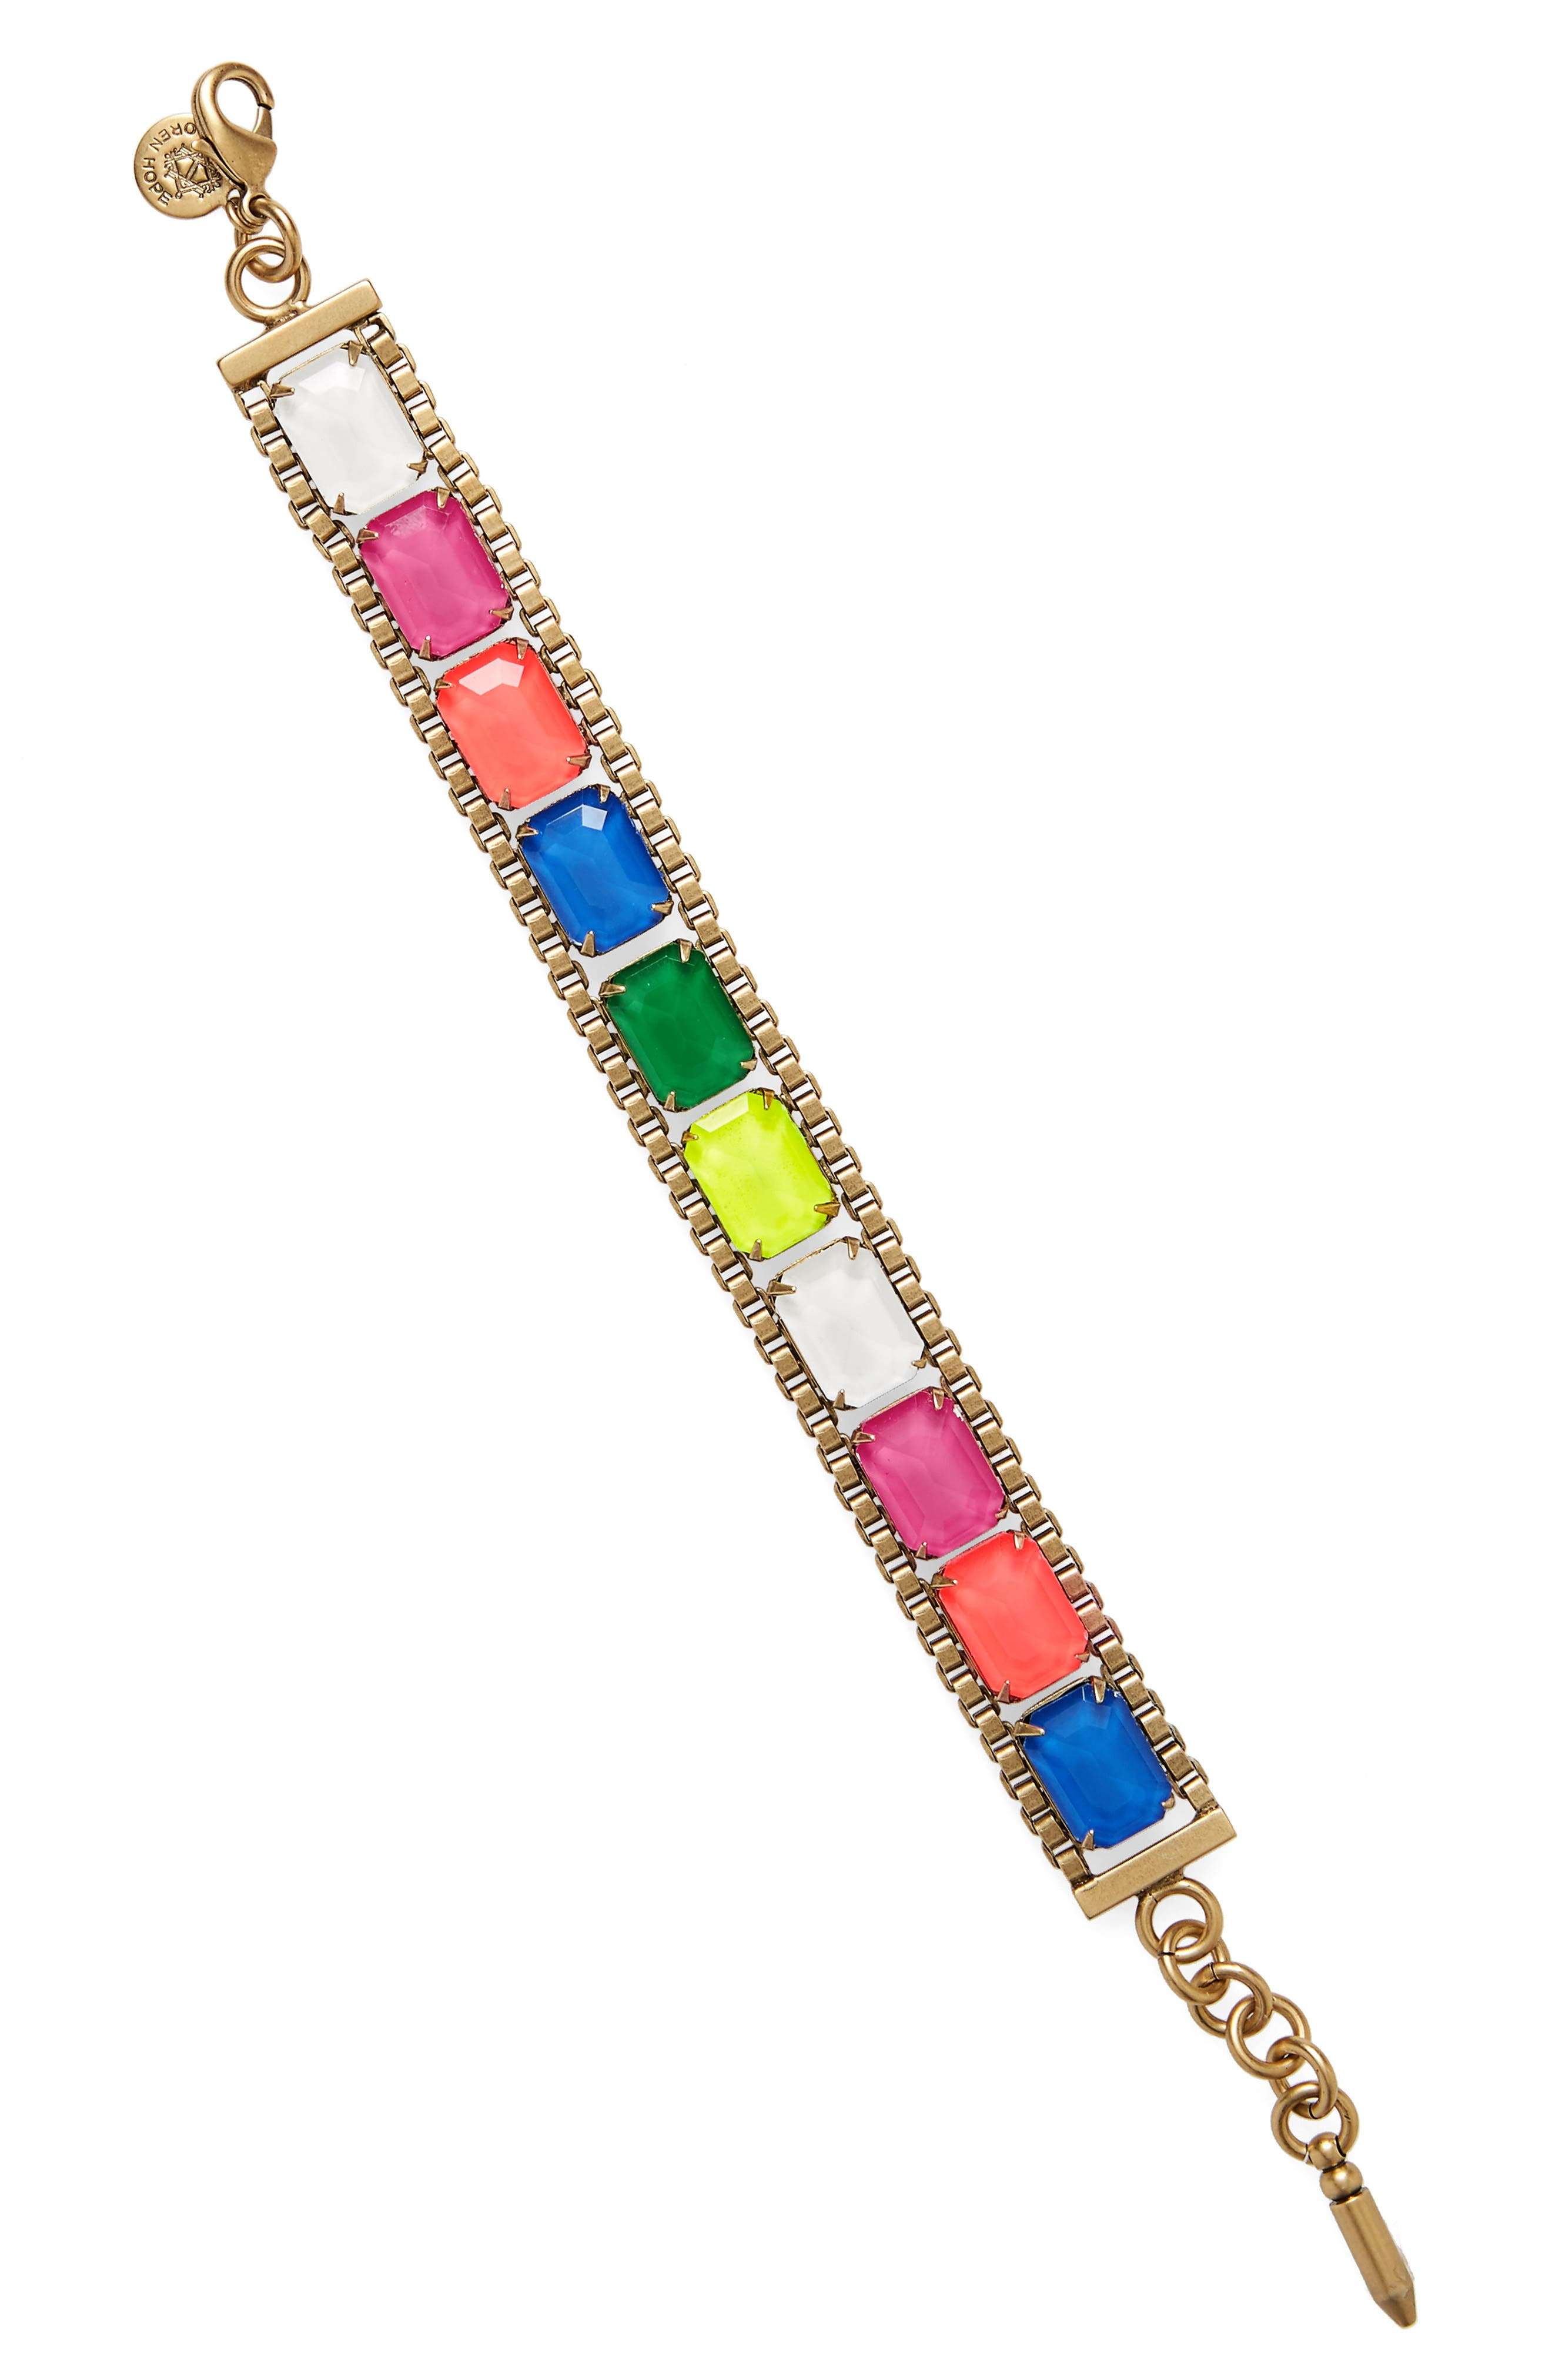 Main Image - Loren Hope Scarlet Mixed Jewel Bracelet